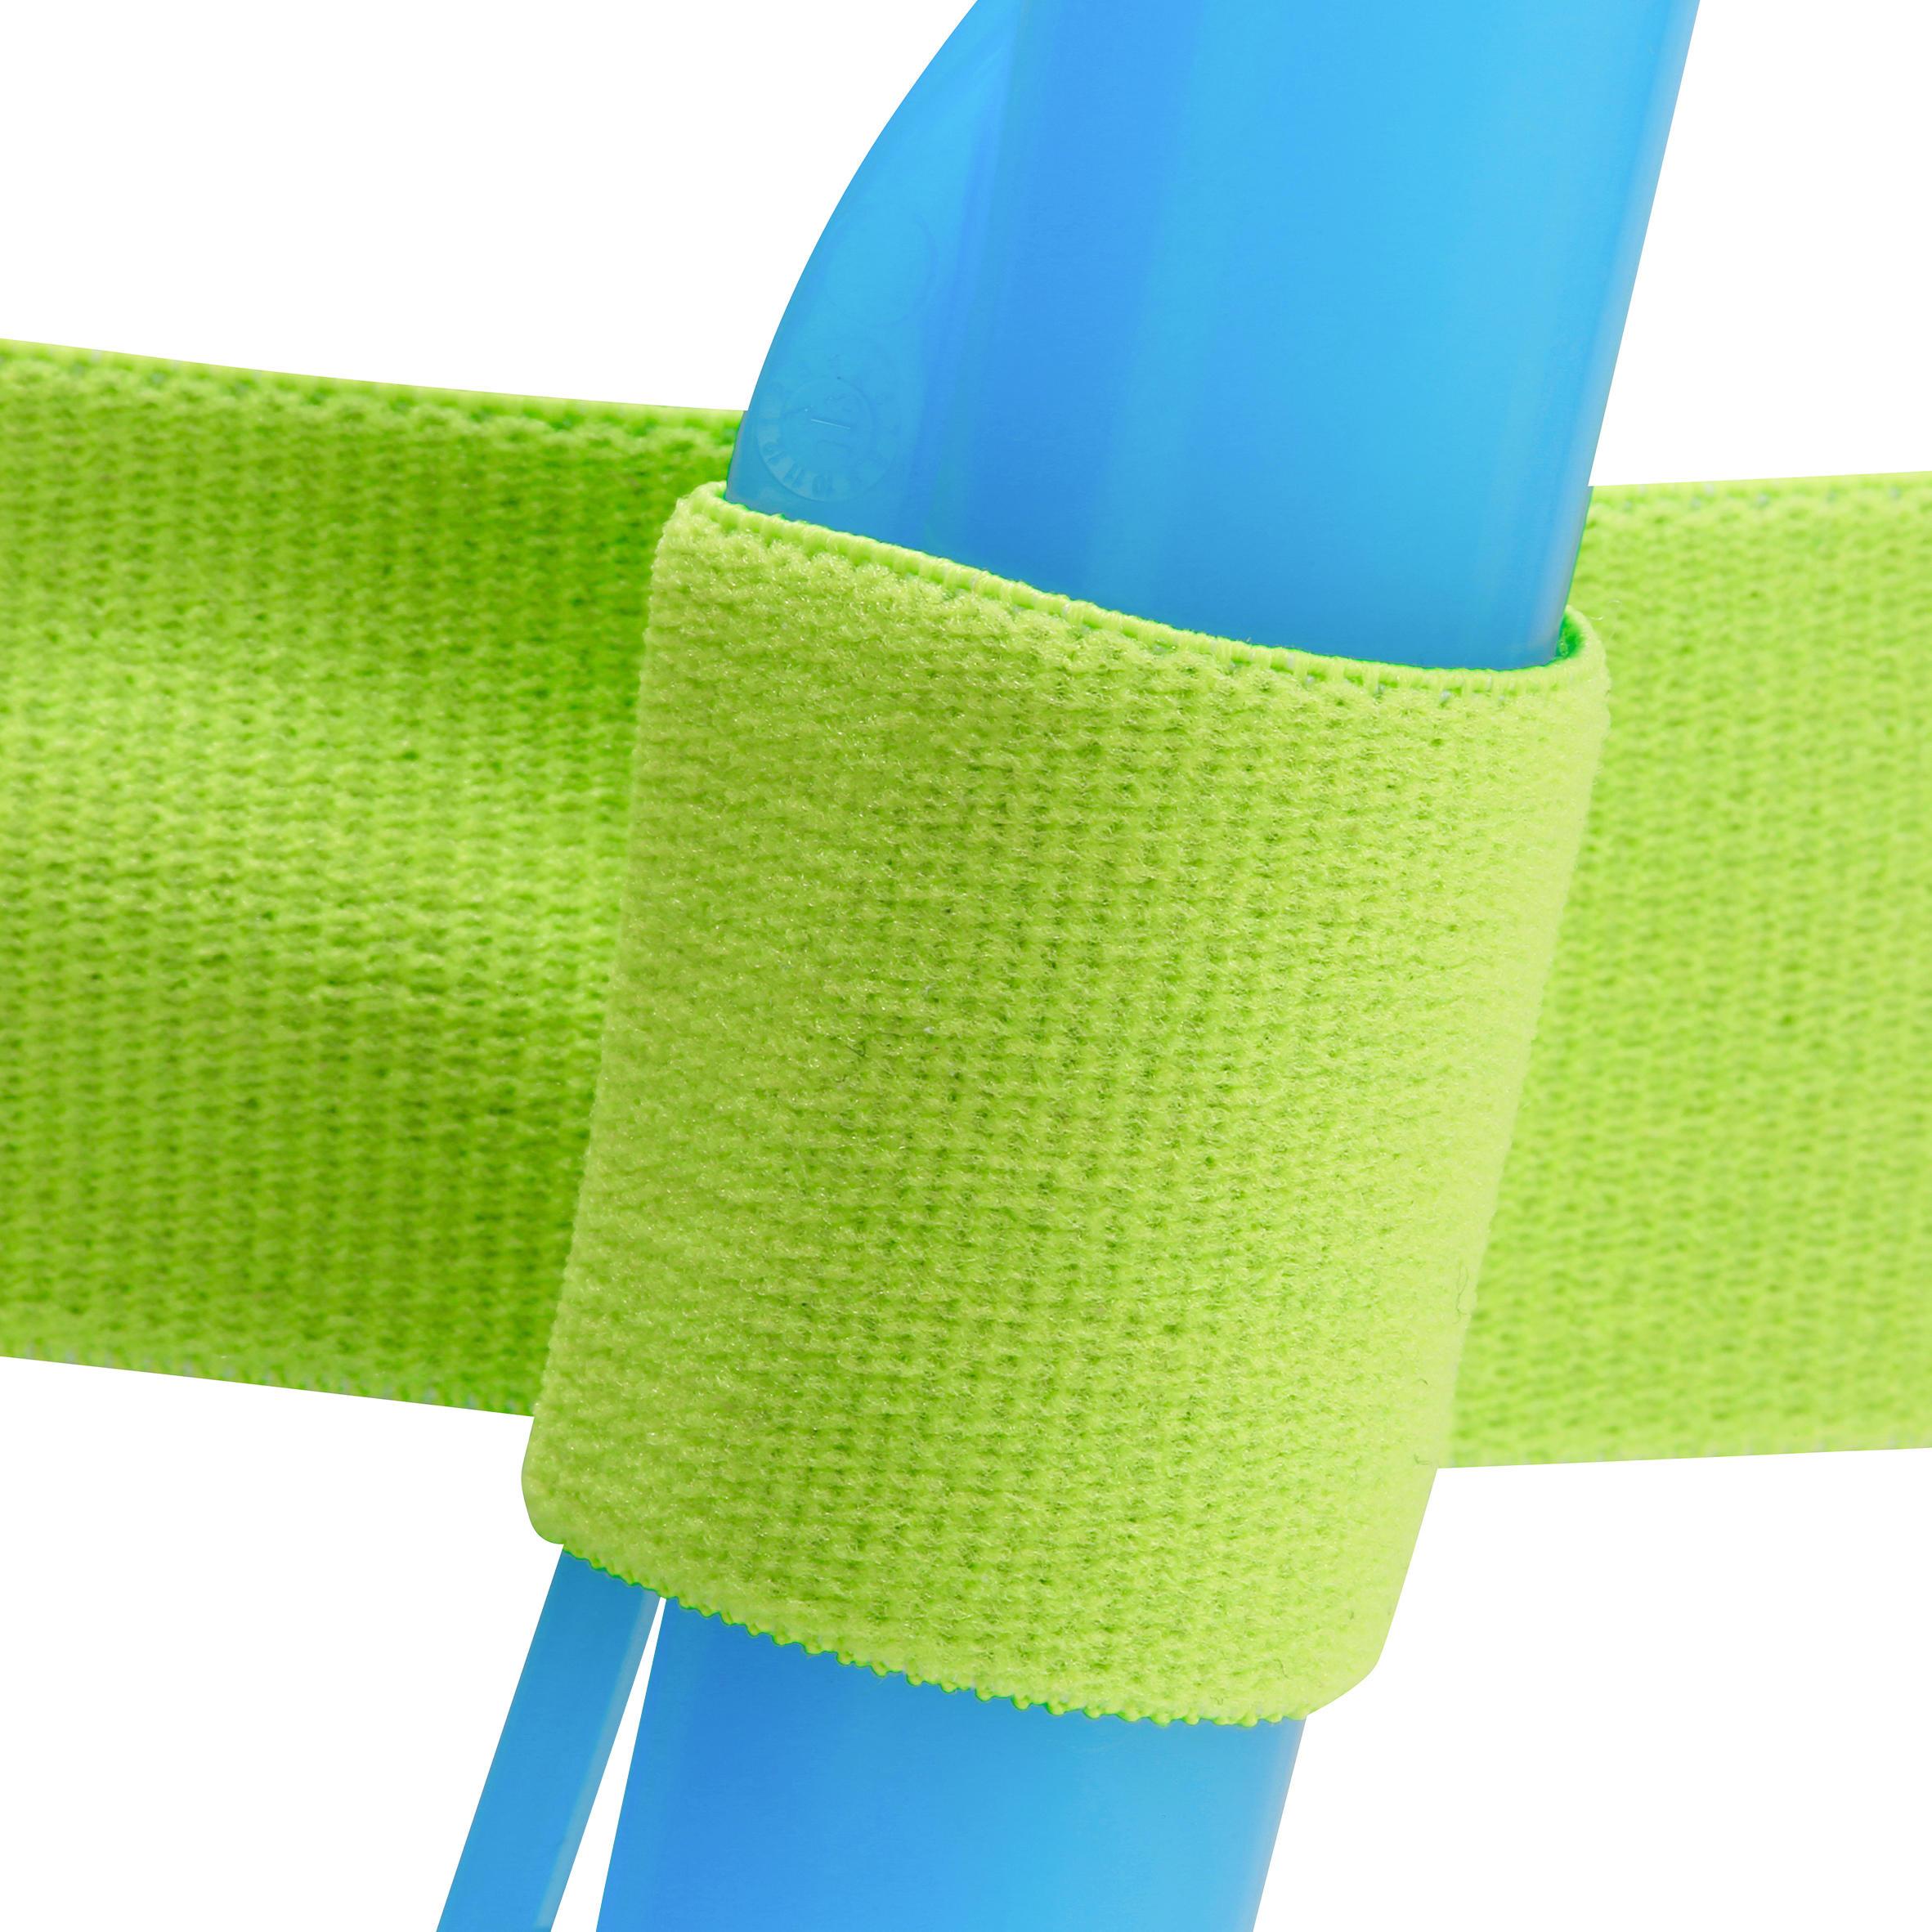 Kit masque tuba d'apnée freediving FRD120 vert pour enfants